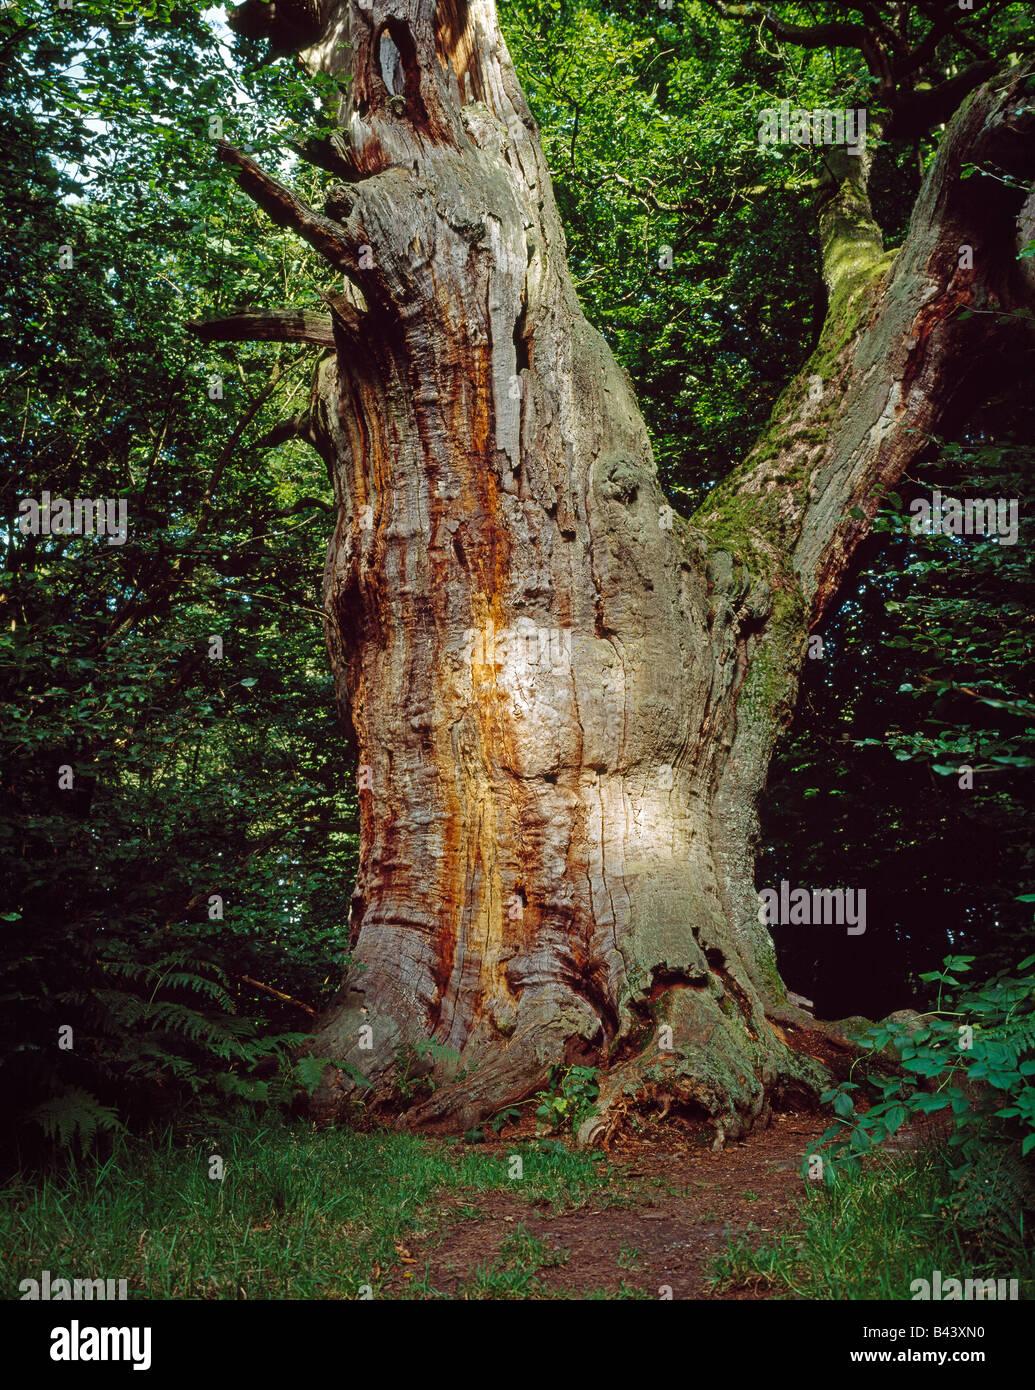 "old oak in the so called ""primary forest"" of Sababurg in the Reinhardswald alte Eiche im Urwald Sababurg - Stock Image"